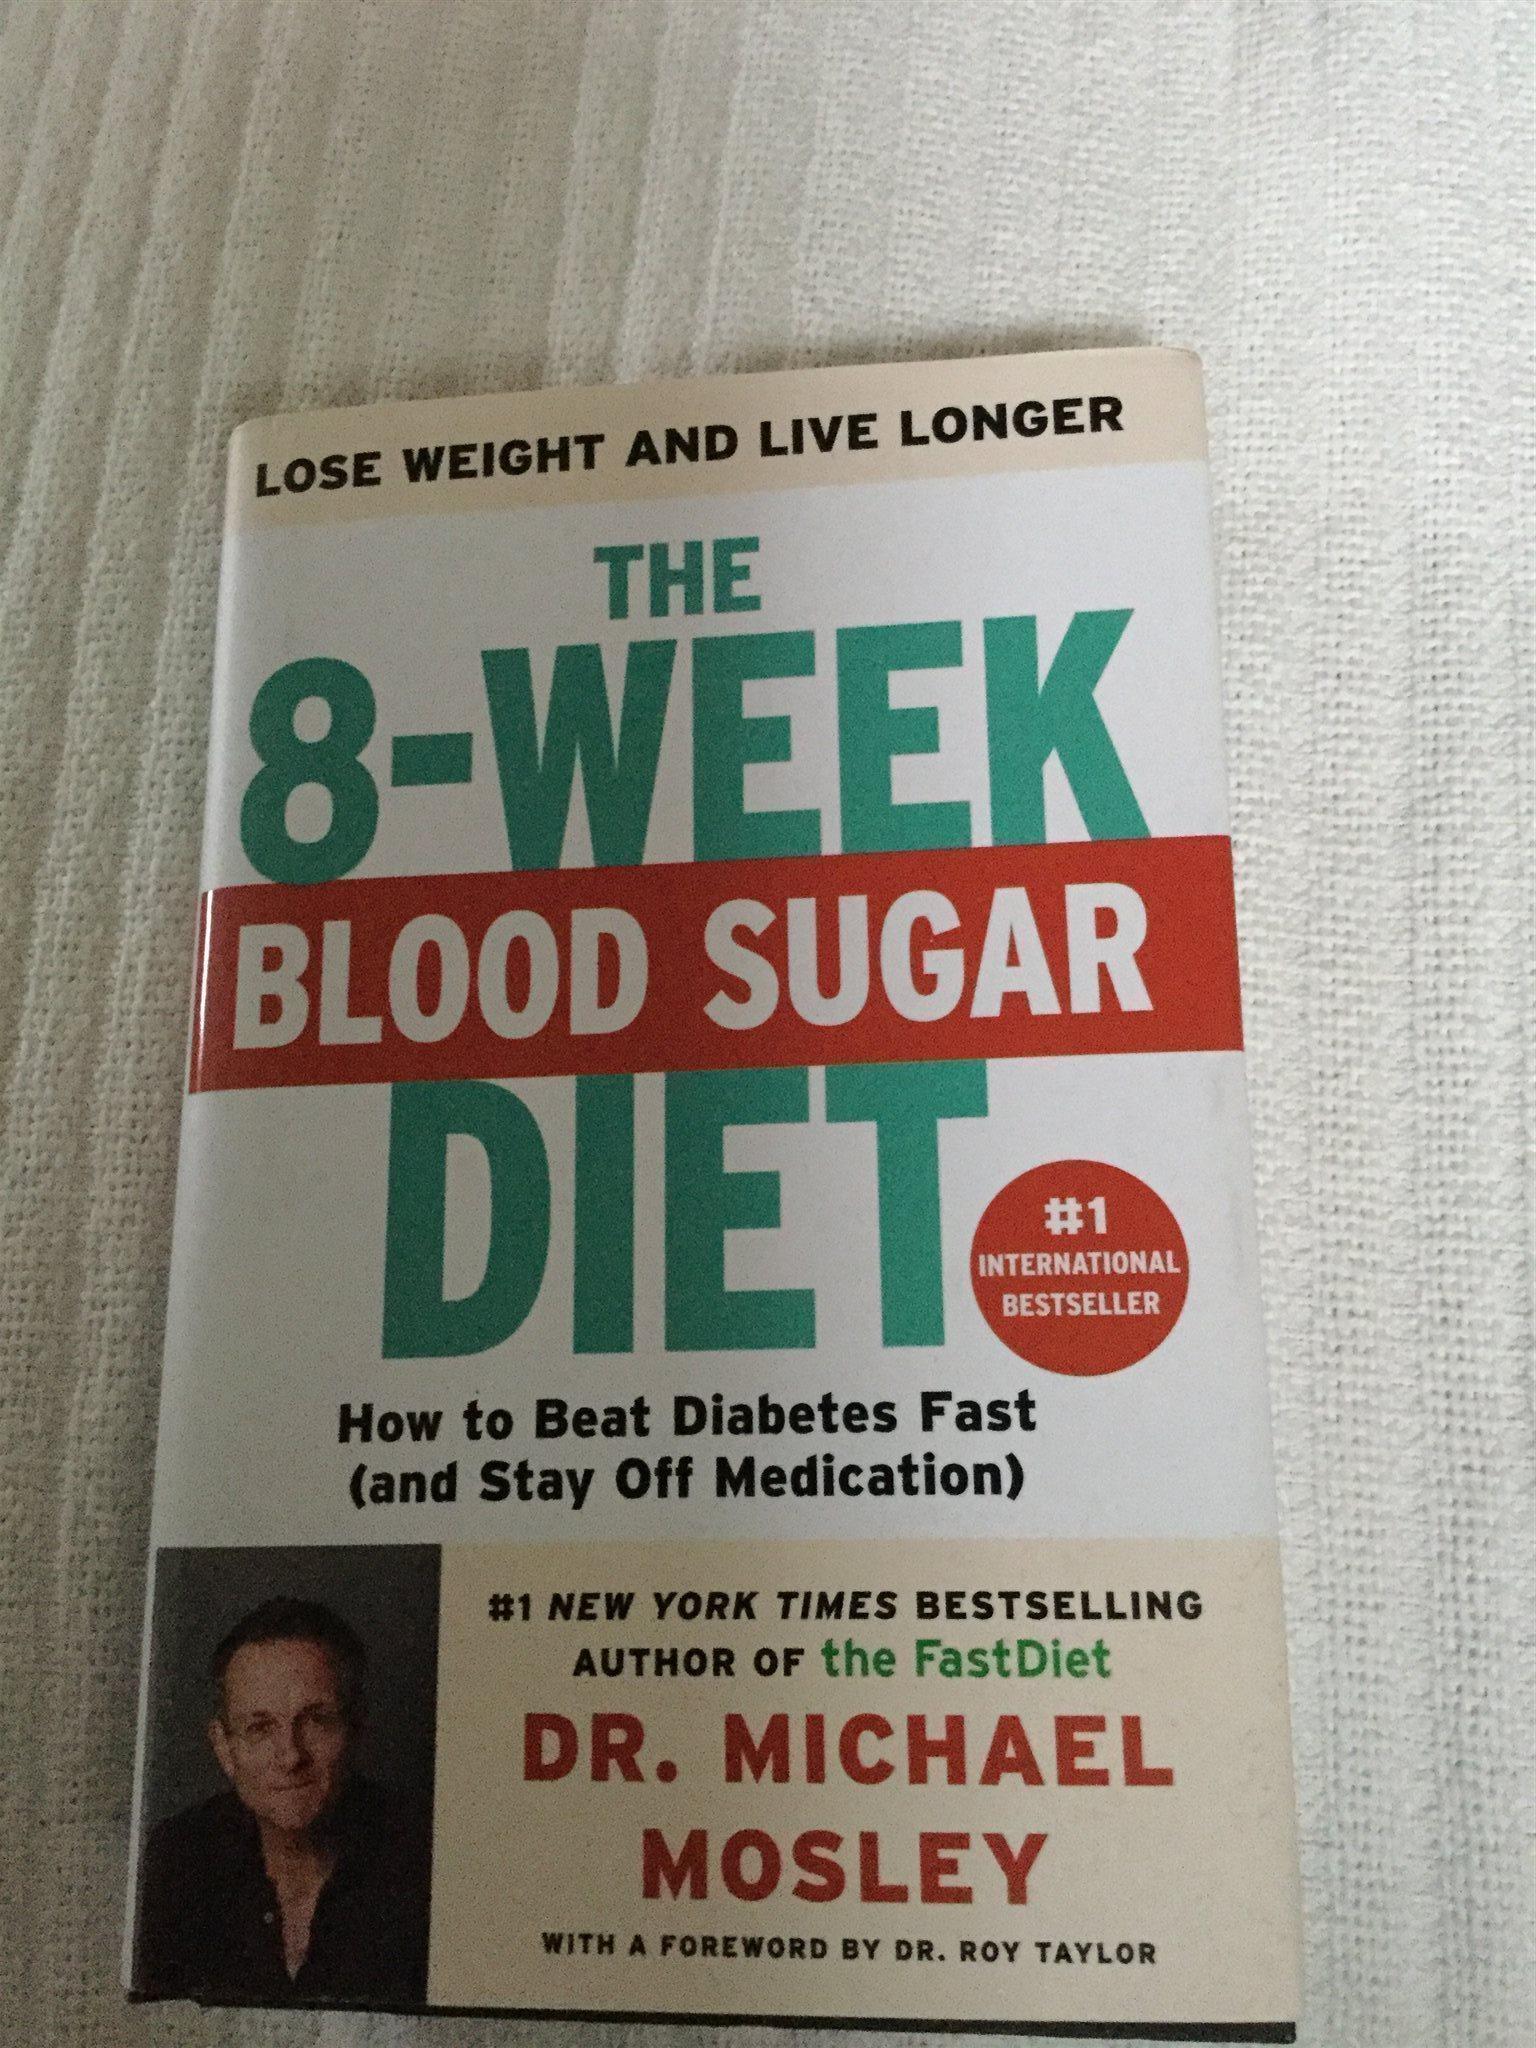 mosley blodsocker diet